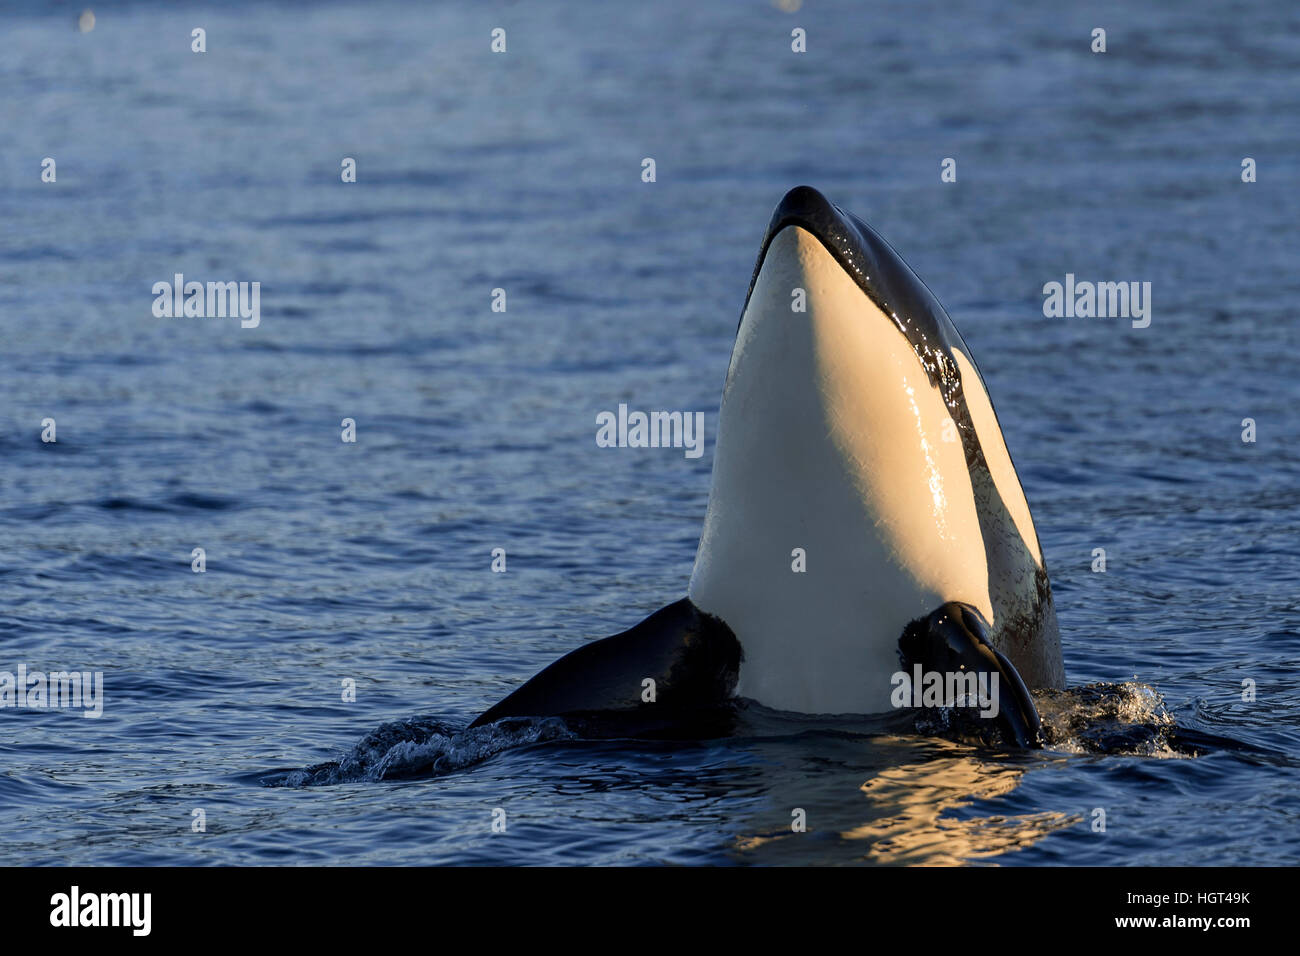 Orca or killer whale (Orcinus orca), spyhopping, Kaldfjorden, Norway - Stock Image